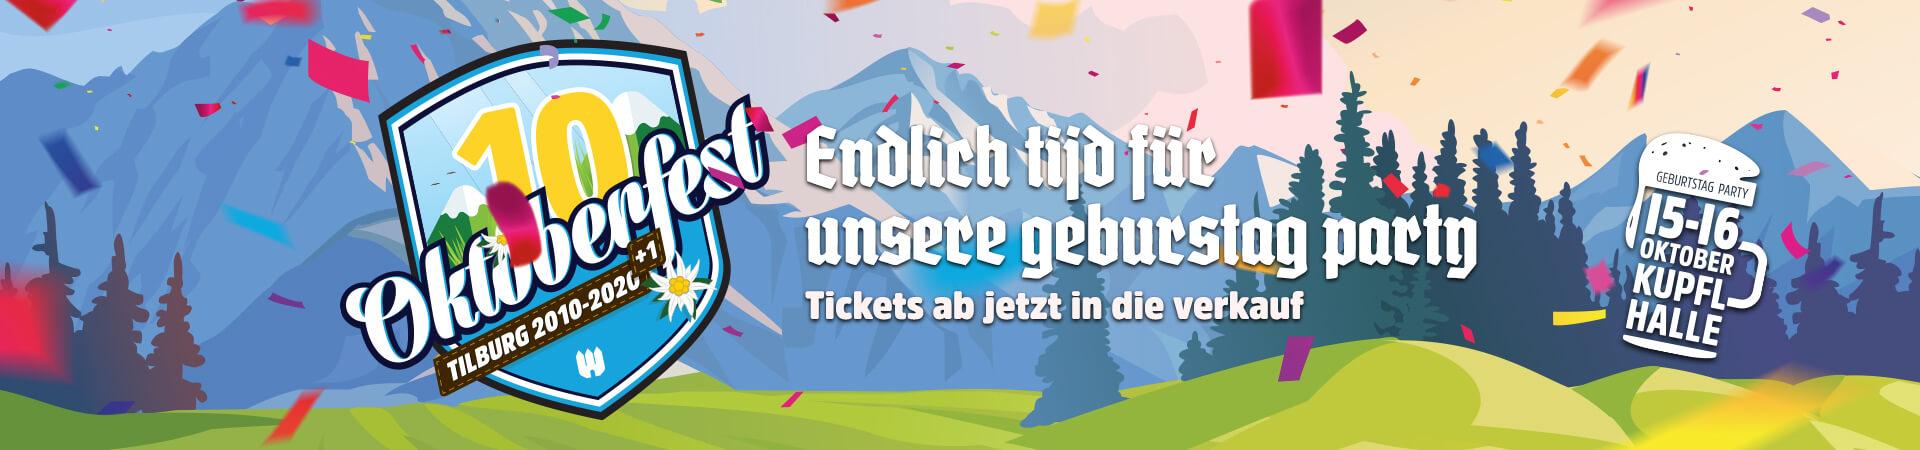 Oktoberfest Tilburg online tickets